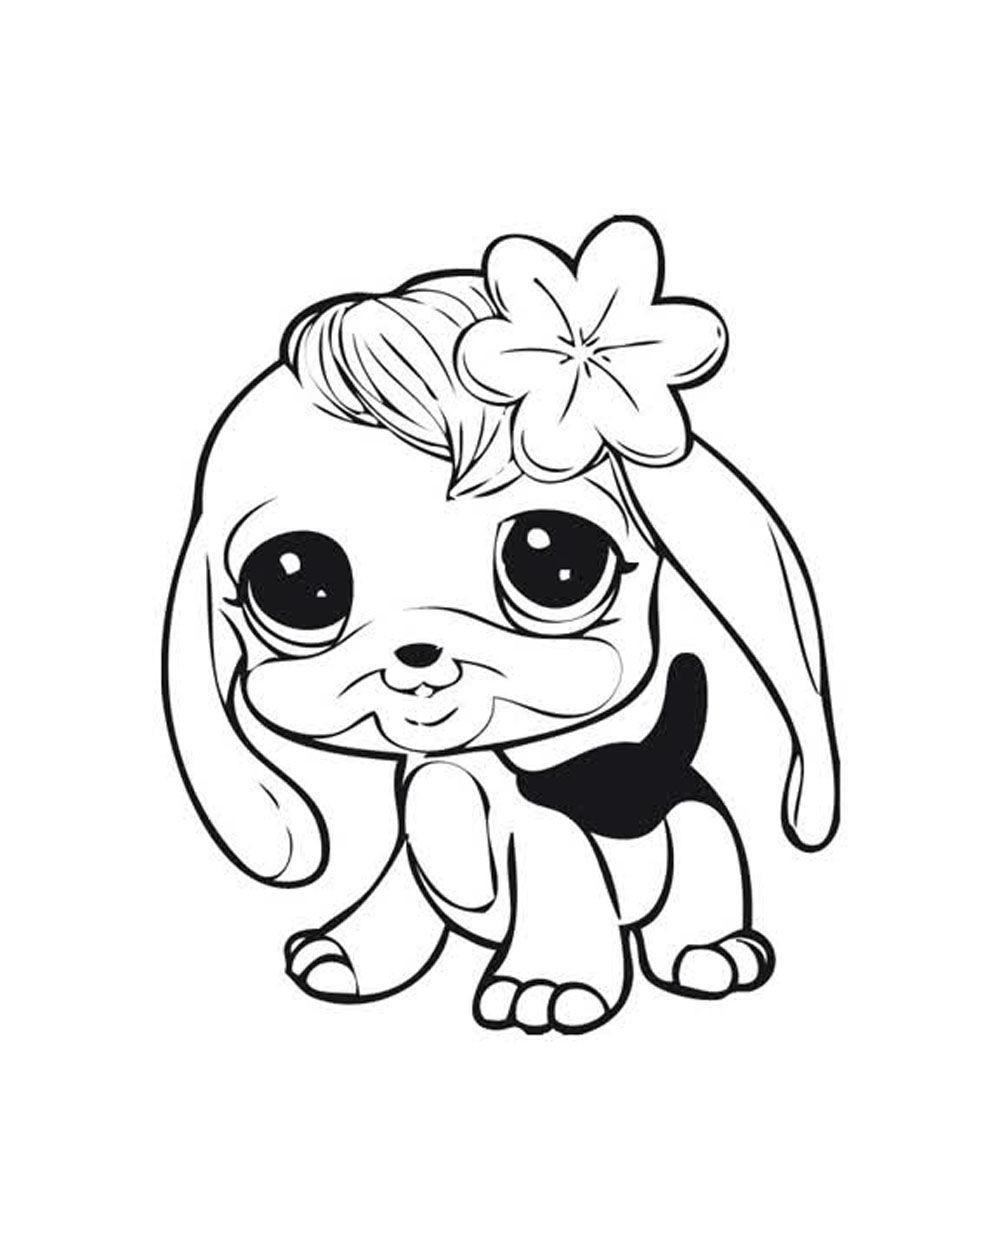 Littlest Pet Shop Coloring Pages  Littlest Pet Shops Coloring Page for My Kids